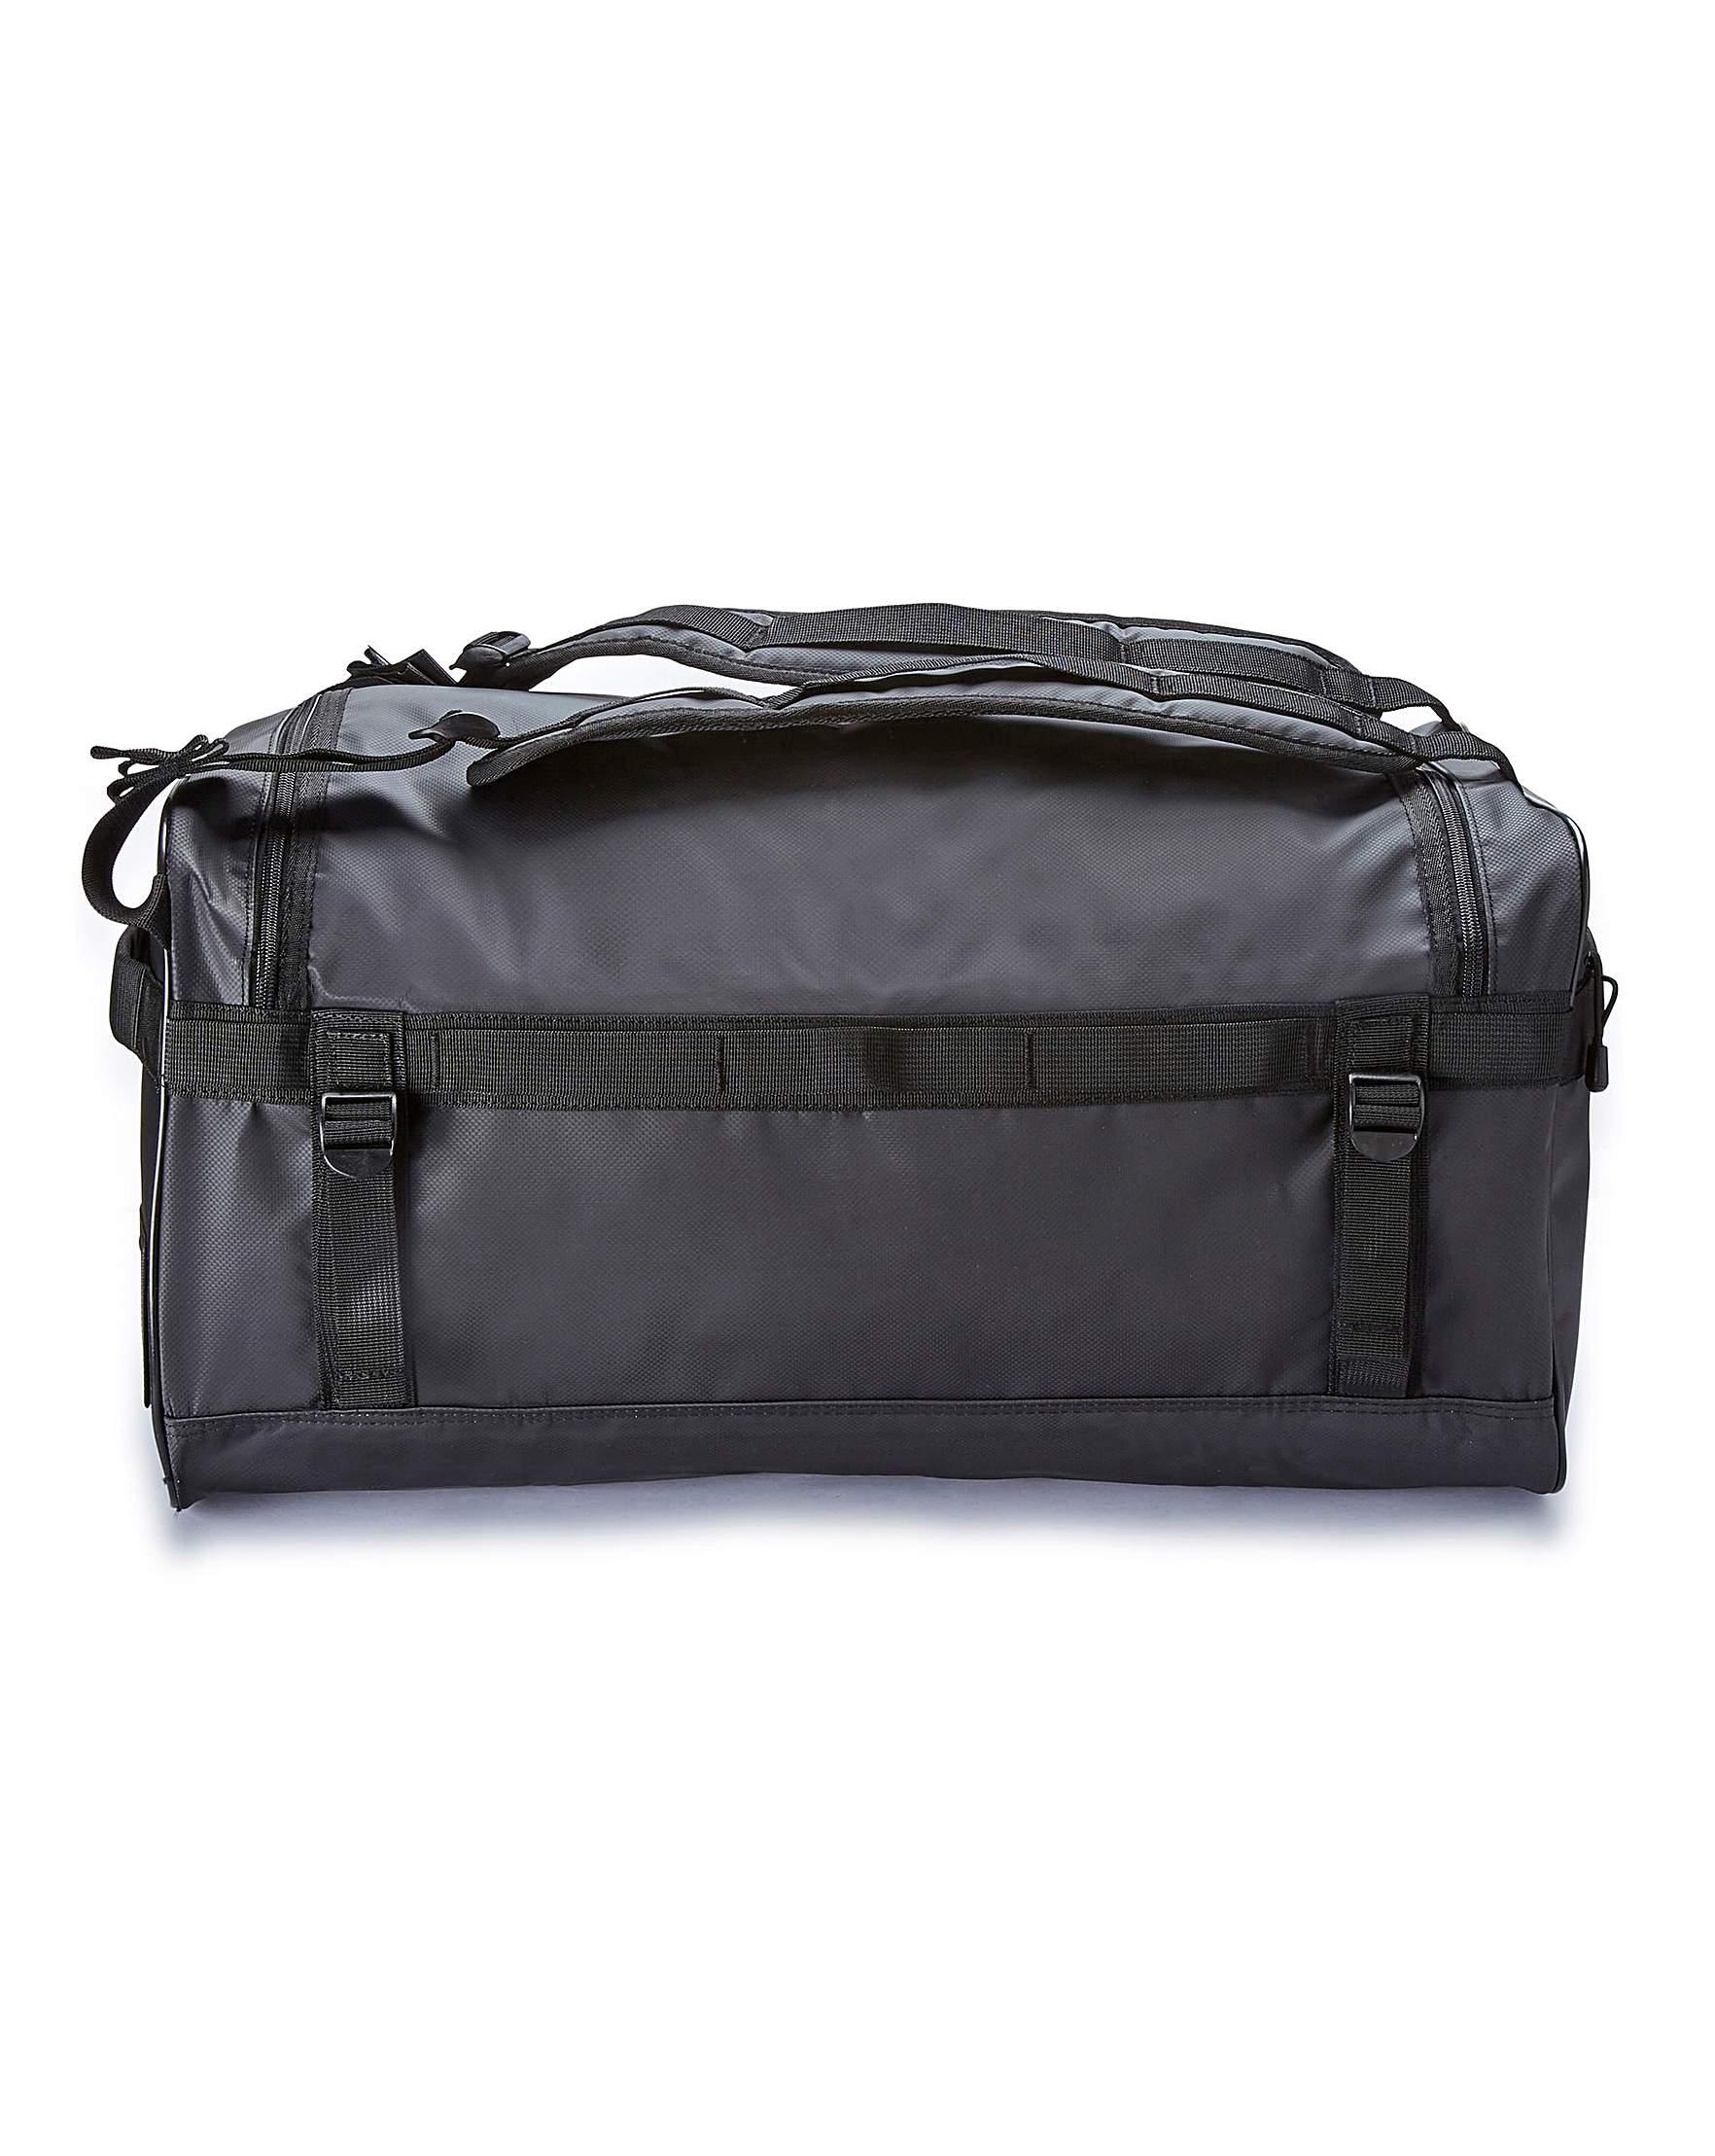 3dca8be8f1 Helly Hansen Duffle Bag